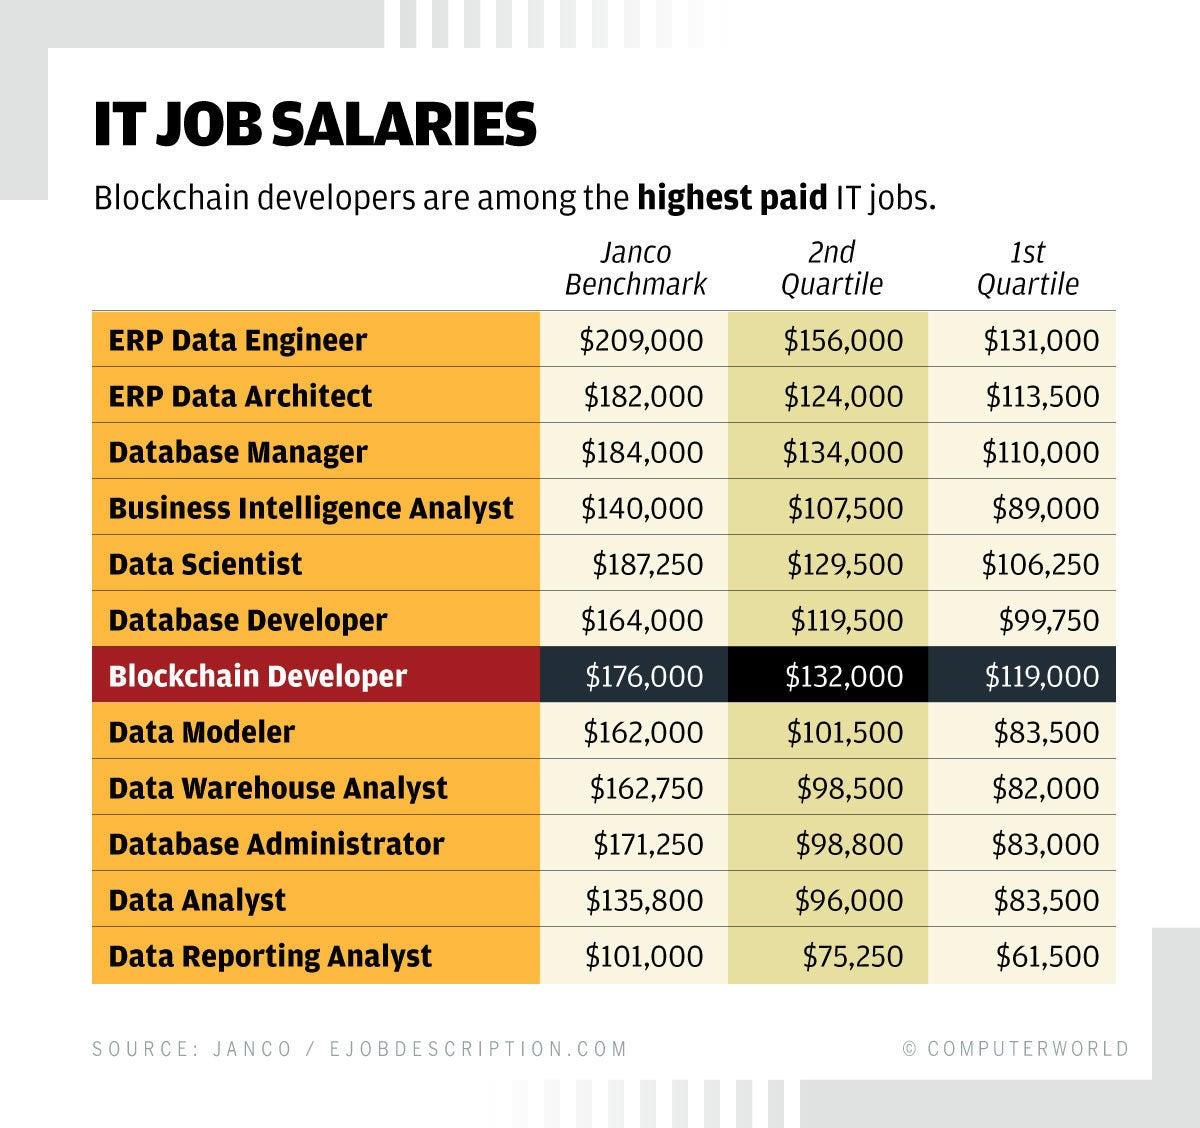 Blockchain Craze Helps Push Up Related Salaries